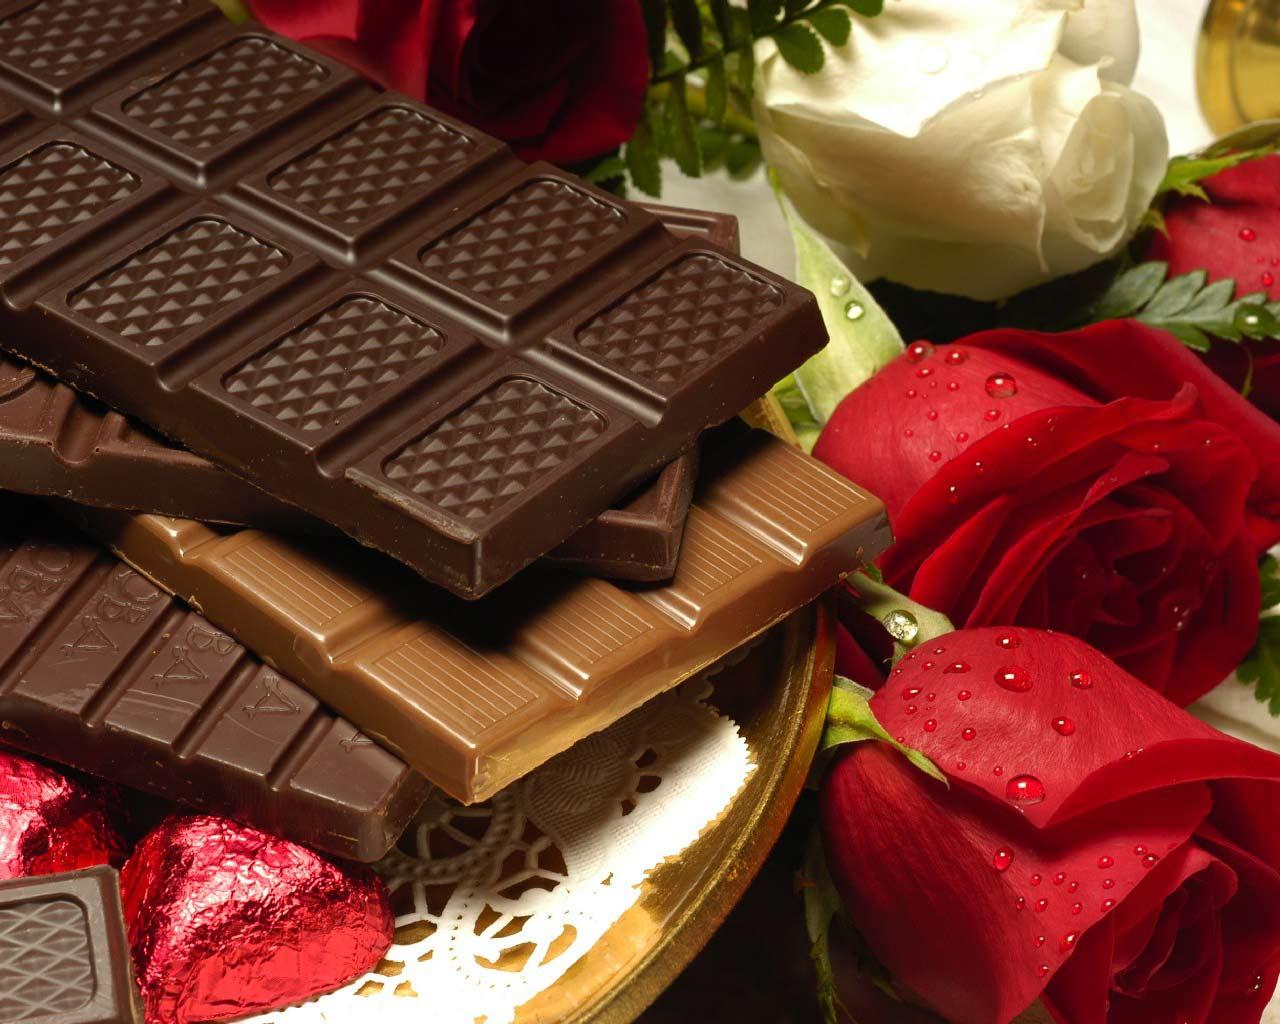 external image choco-chocolate-806296_1280_1024.jpg